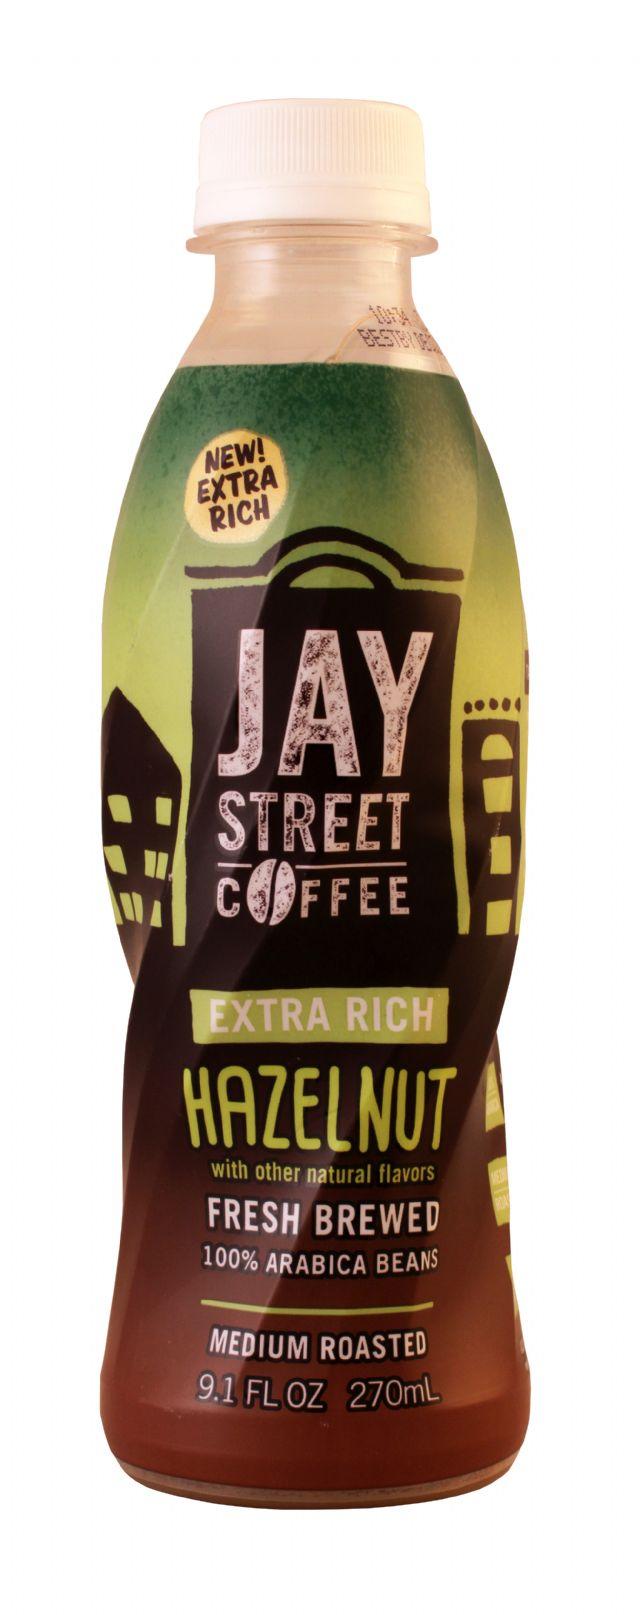 Jay Street Coffee: JayStreet Hazelnut Front